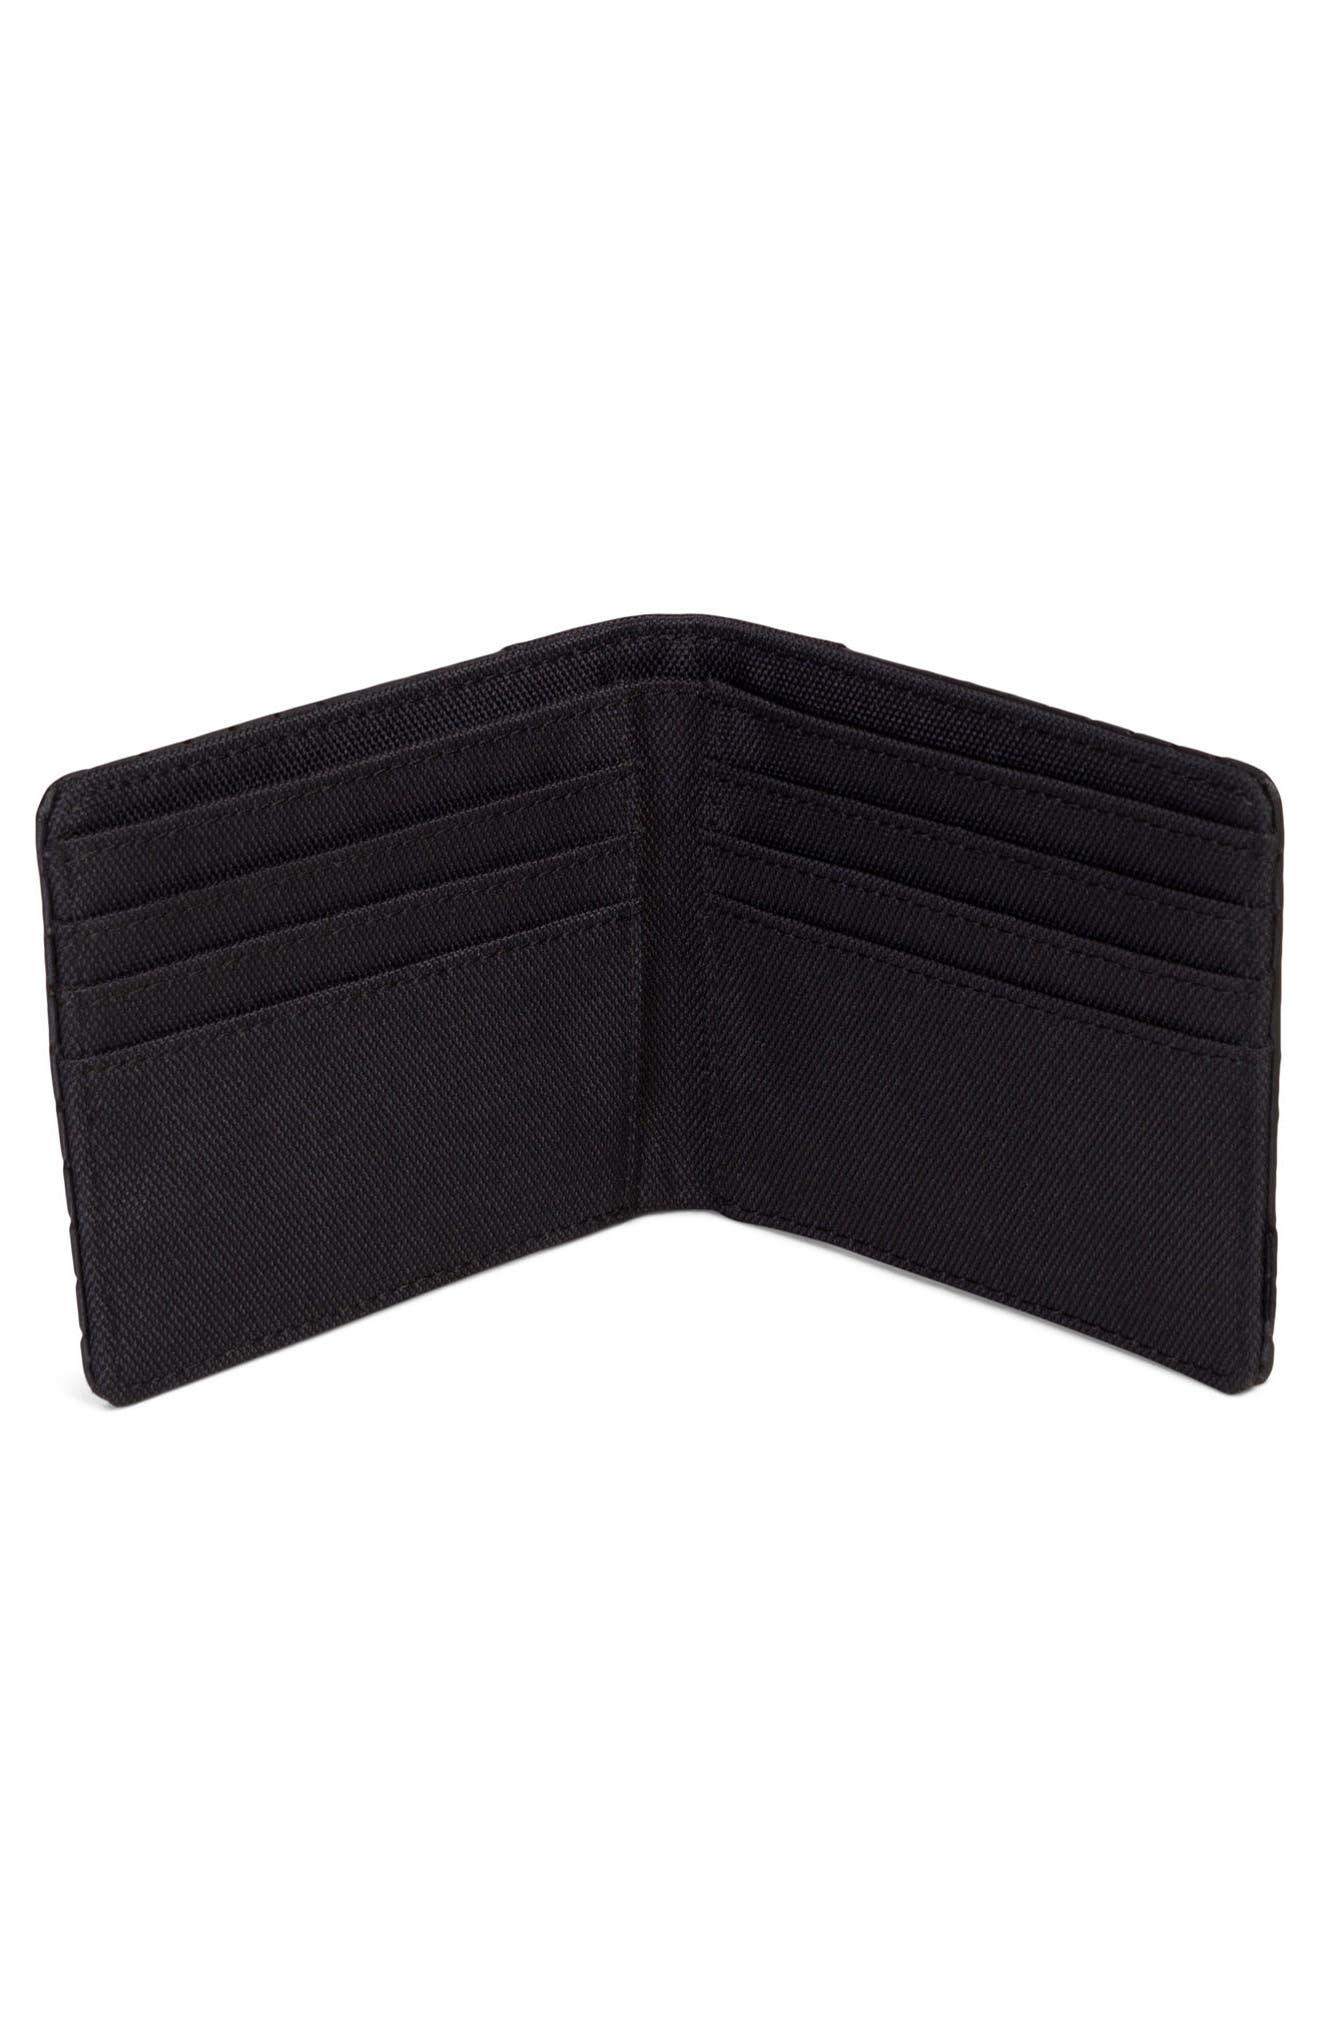 Edward Aspect Perforated Wallet,                             Alternate thumbnail 2, color,                             Black